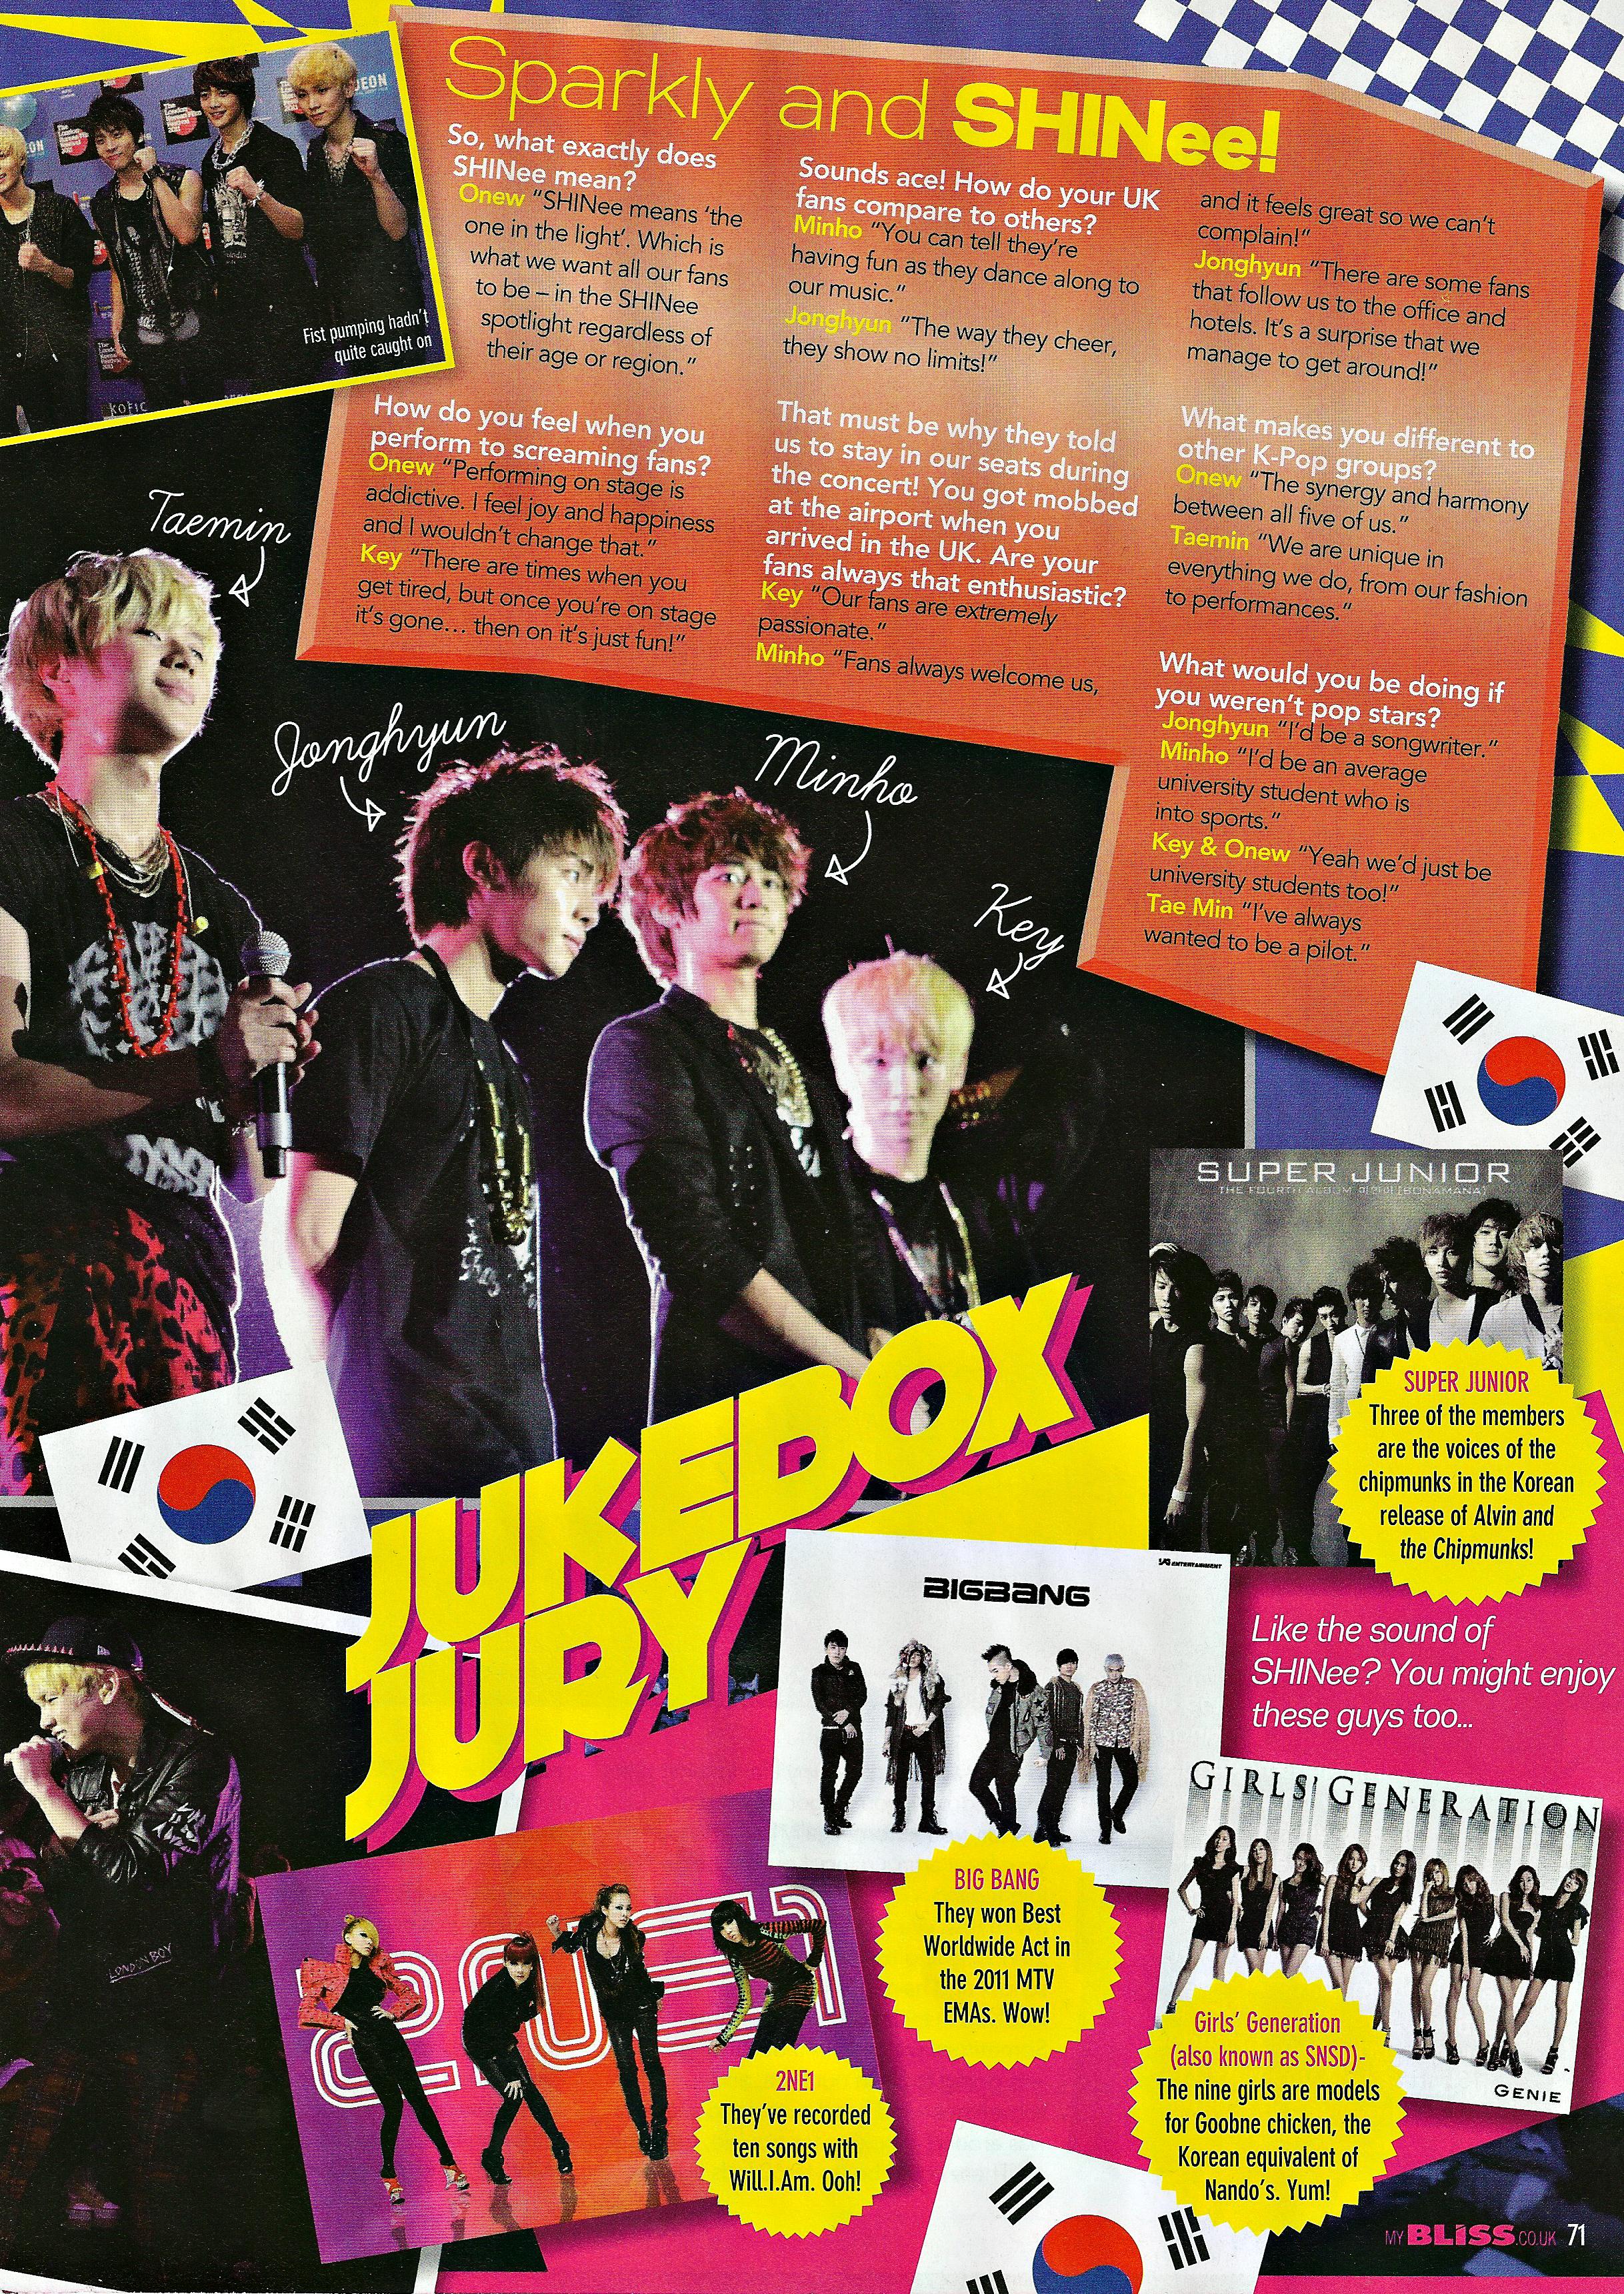 040312 SHINee - Bliss Magazine Scans, April 2012 Edition 6952783721_ec28d419a5_o